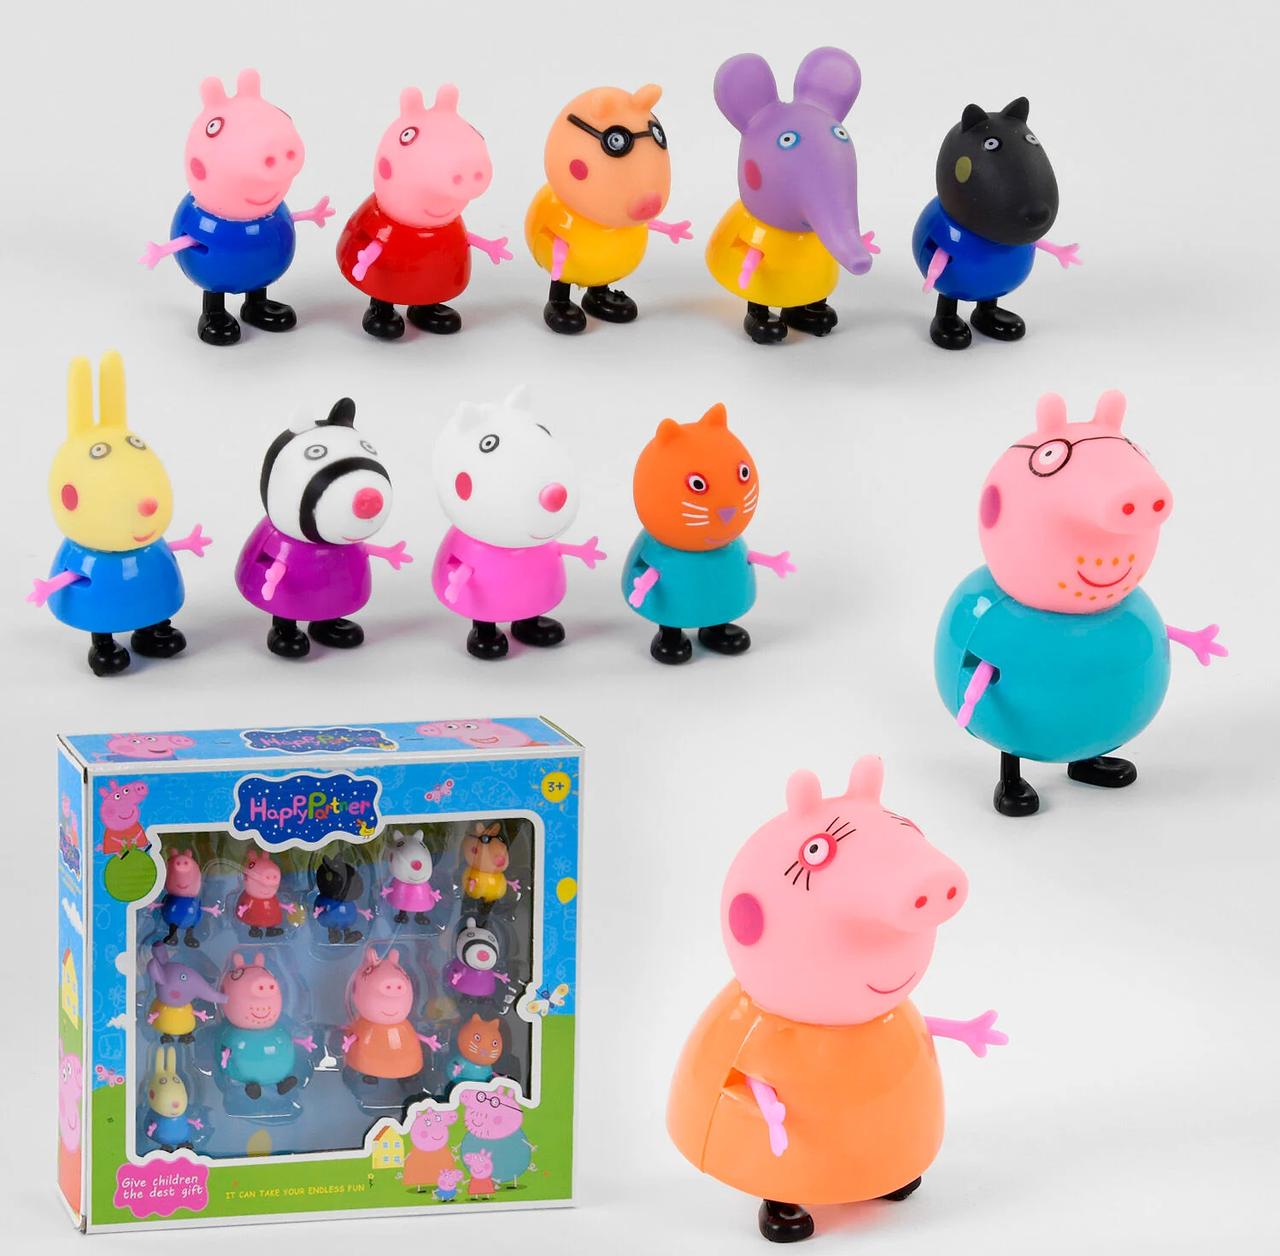 Набор фигурок Свинка Пеппа PP 605-11 персонажи мультфильма